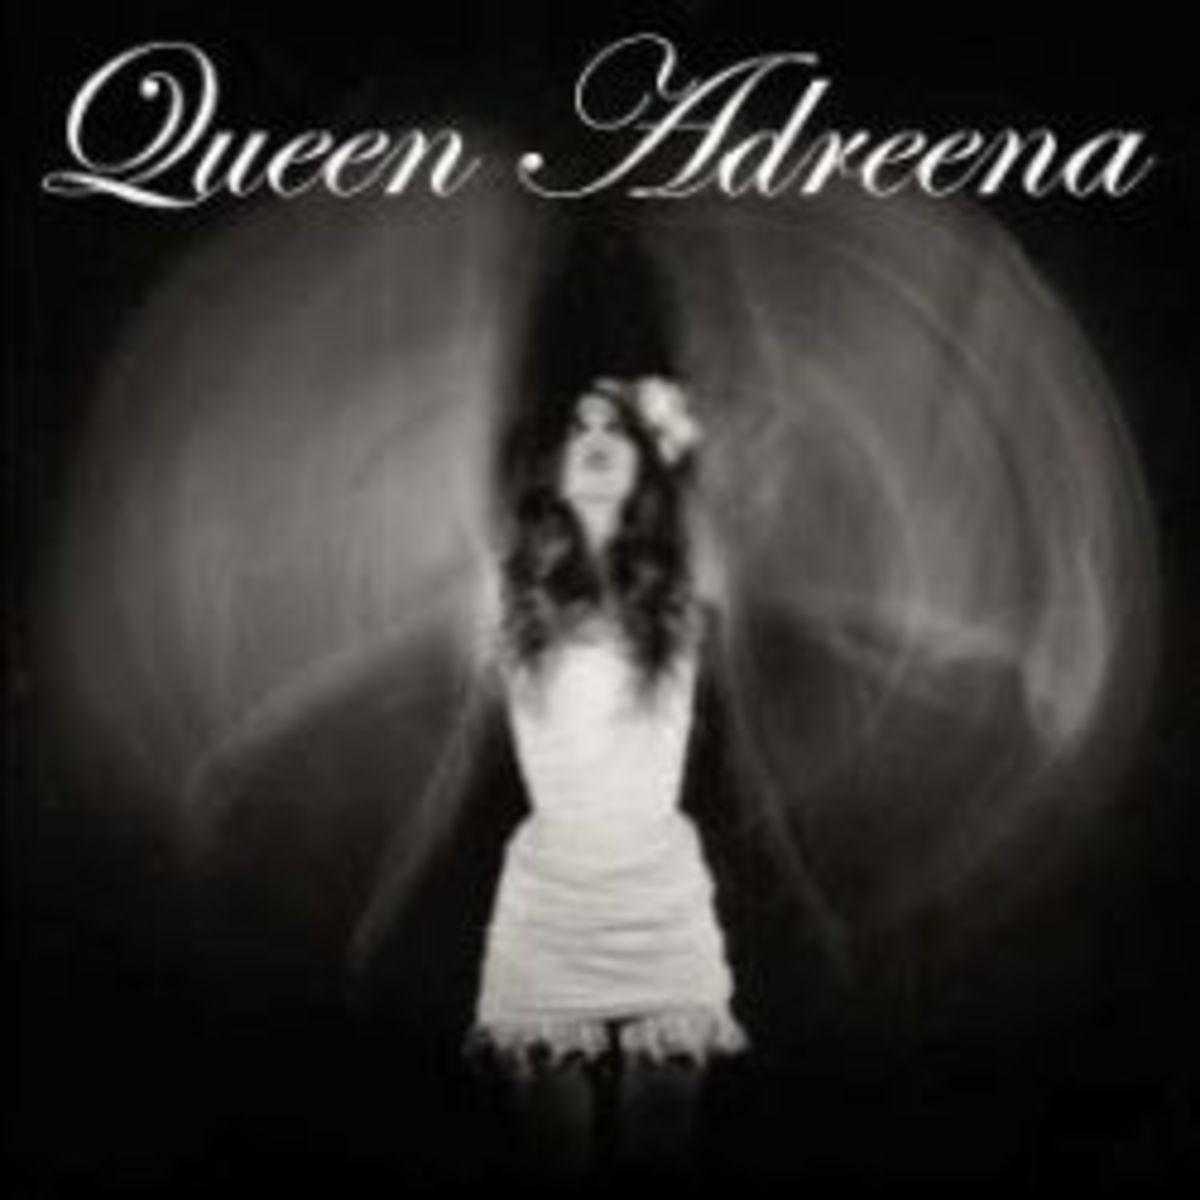 Click photo for Queen Adreena's Store!